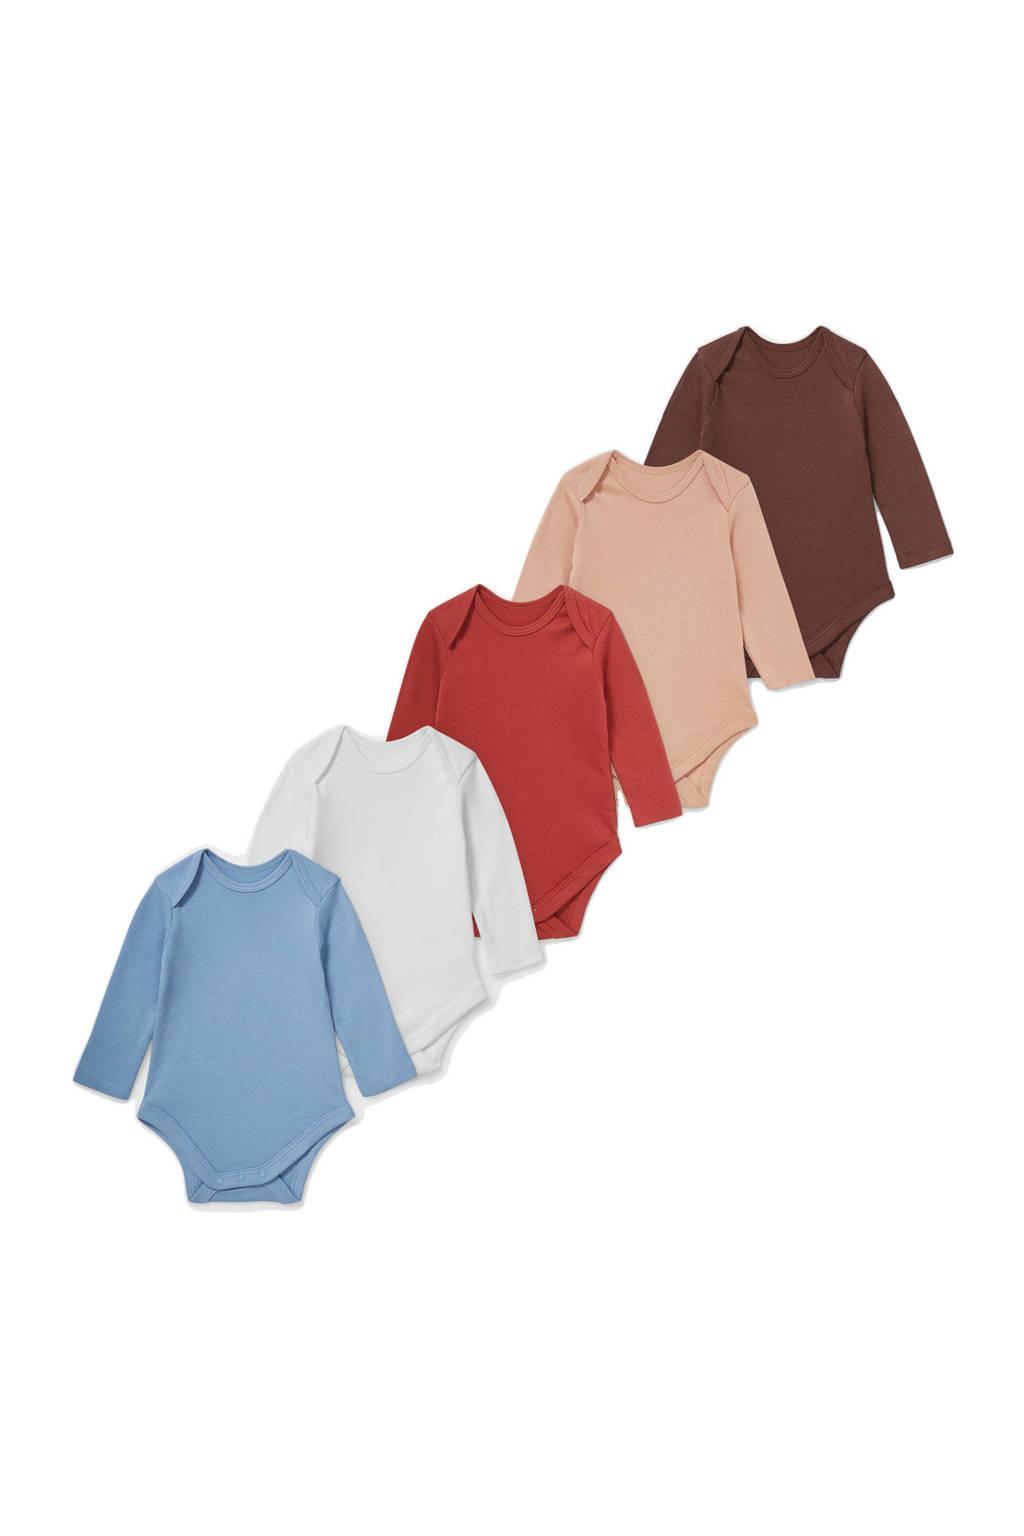 C&A Baby Club romper - set van 5 multi, Blauw/wit/rood/zalm/bruin